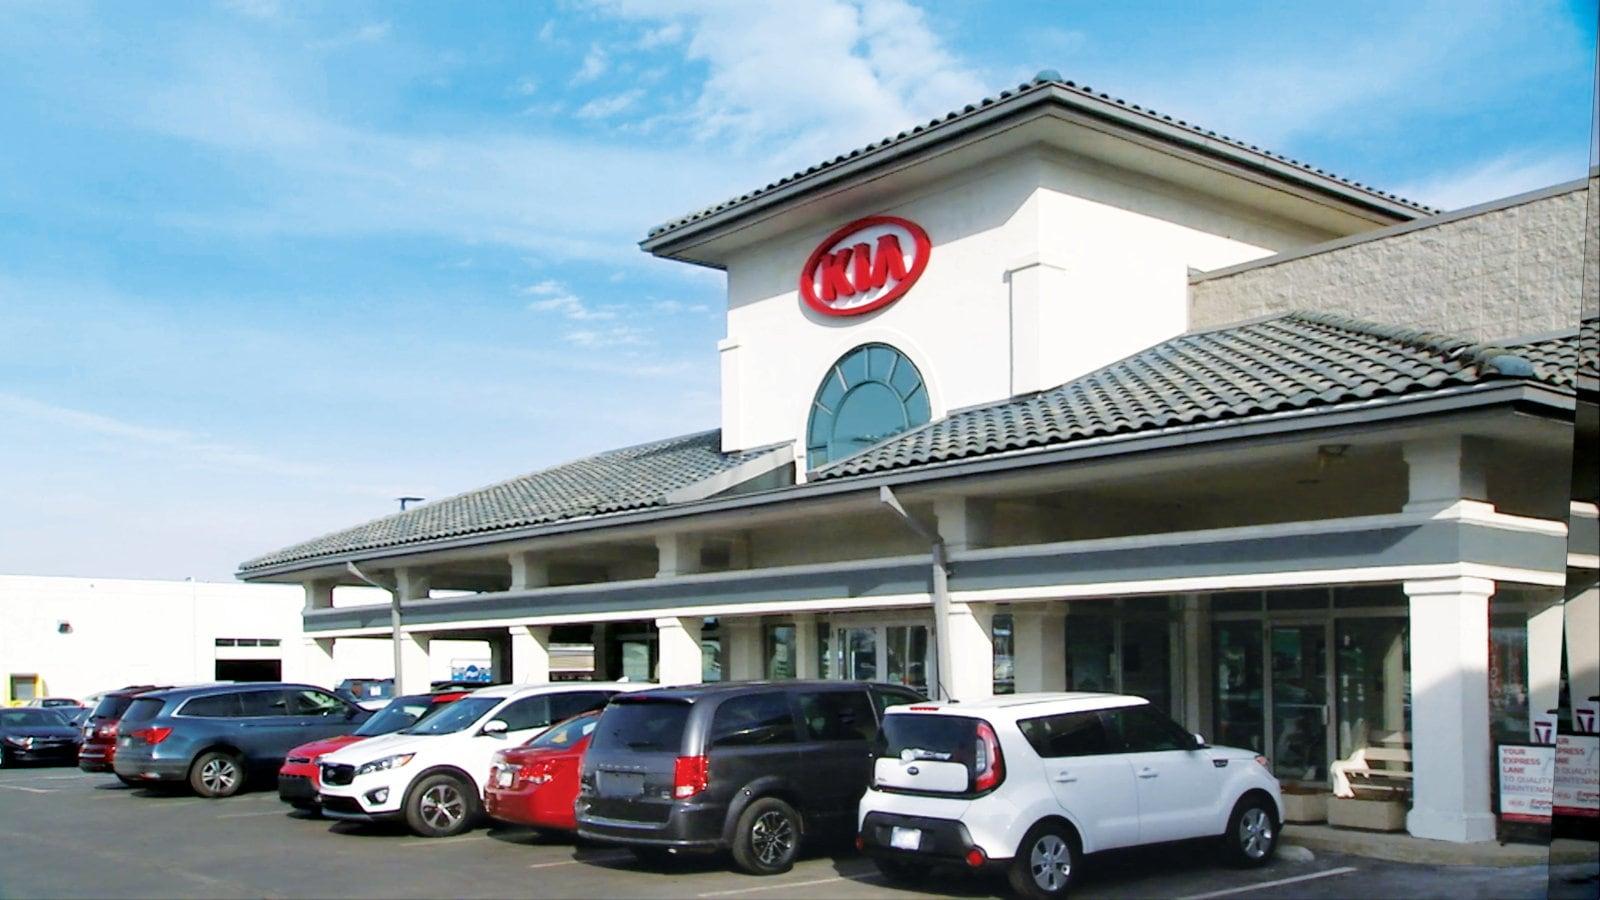 Ed Napleton Kia >> Napleton Kia Of Carmel Kia Dealership Kia Cars Kia